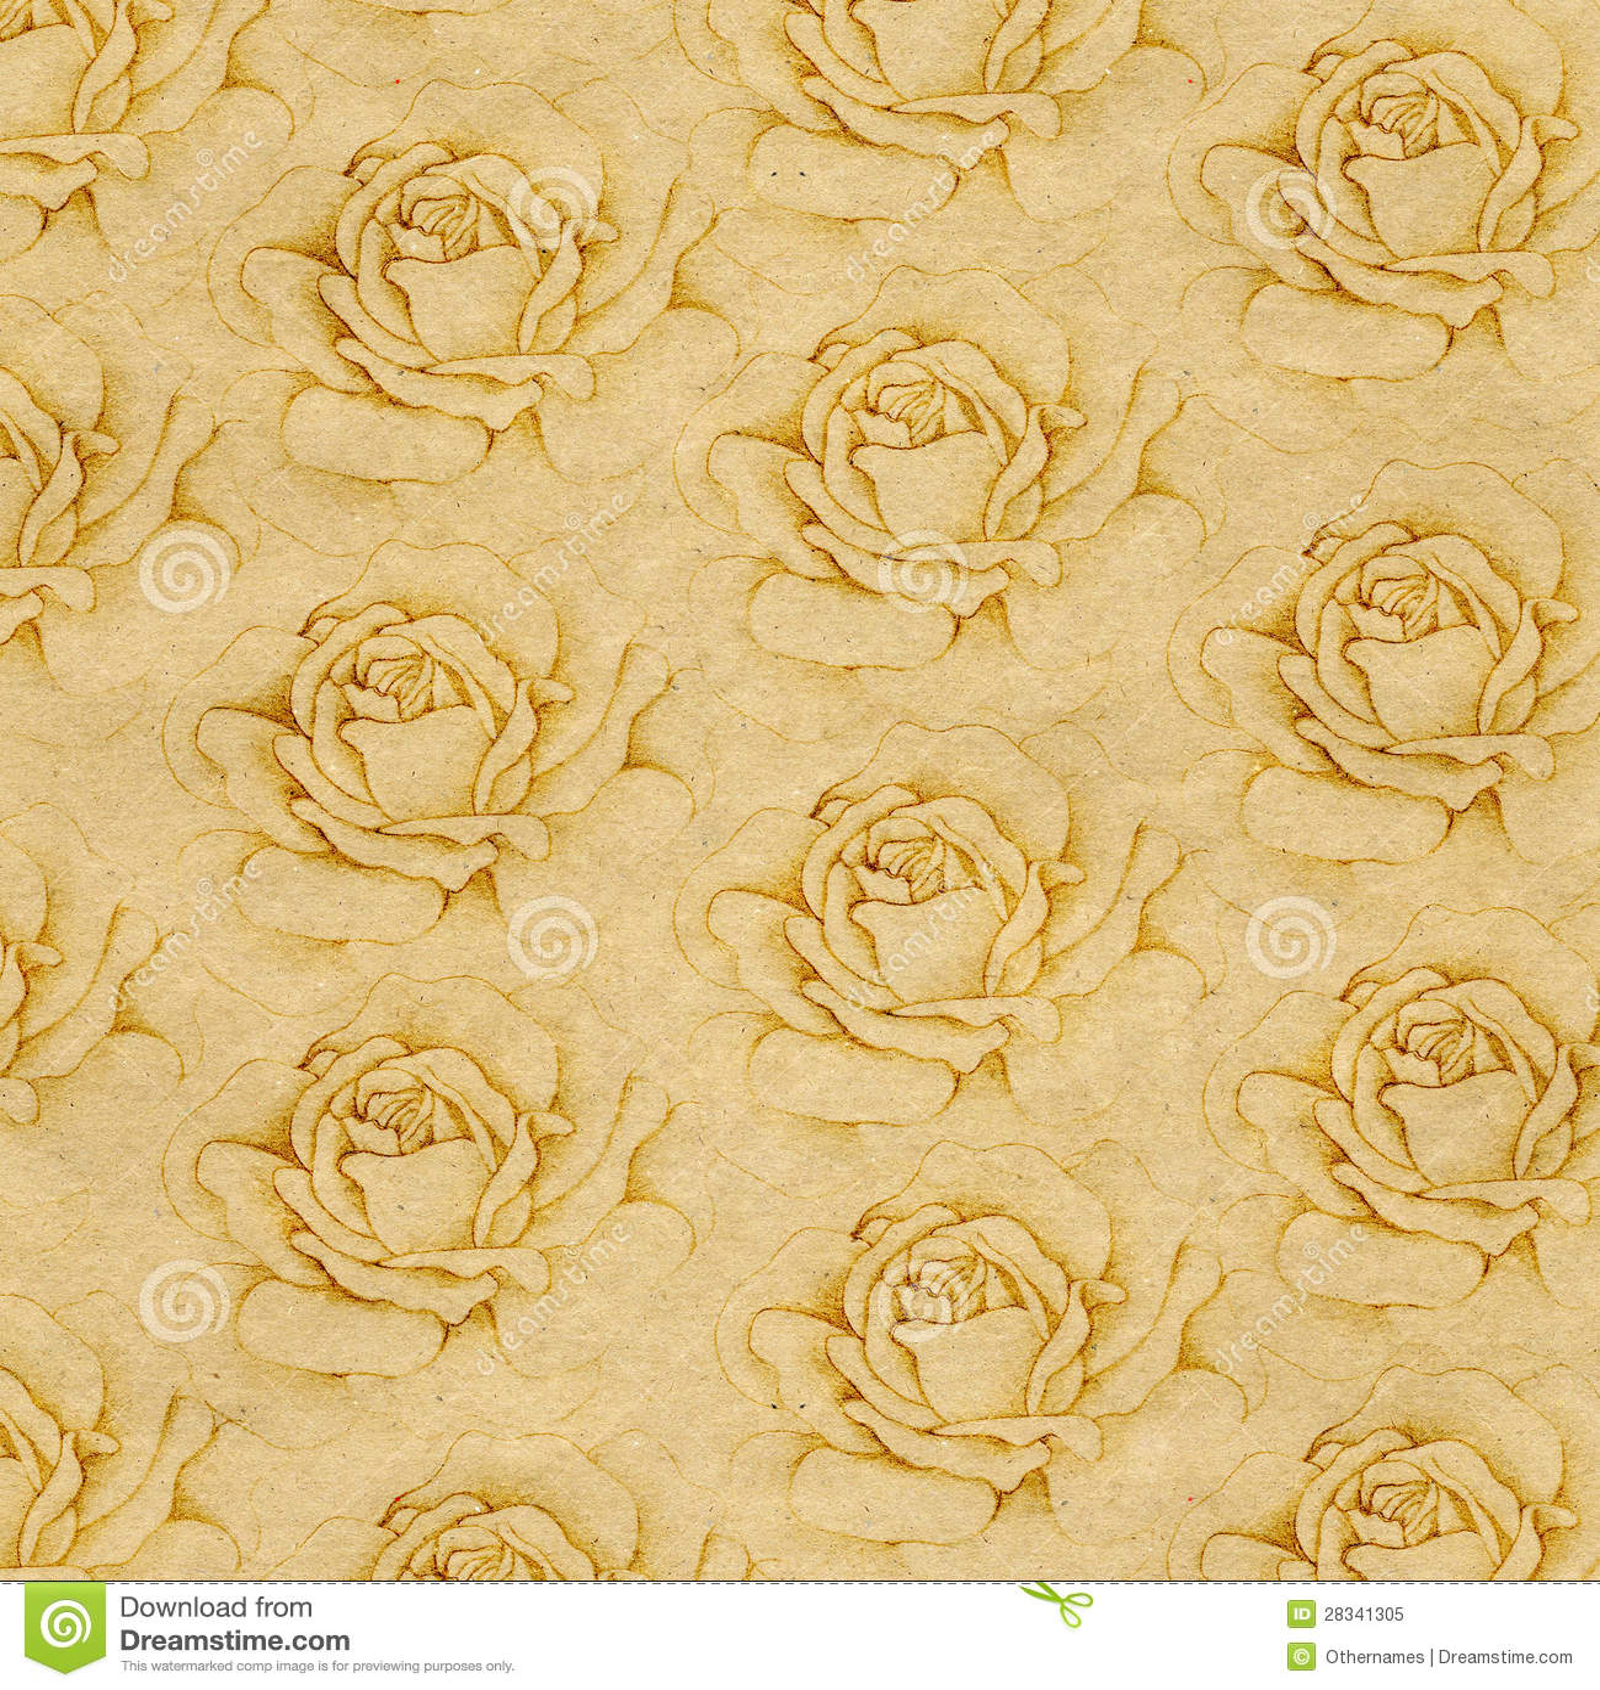 flowery wallpaper background illustration 28341305 megapixl